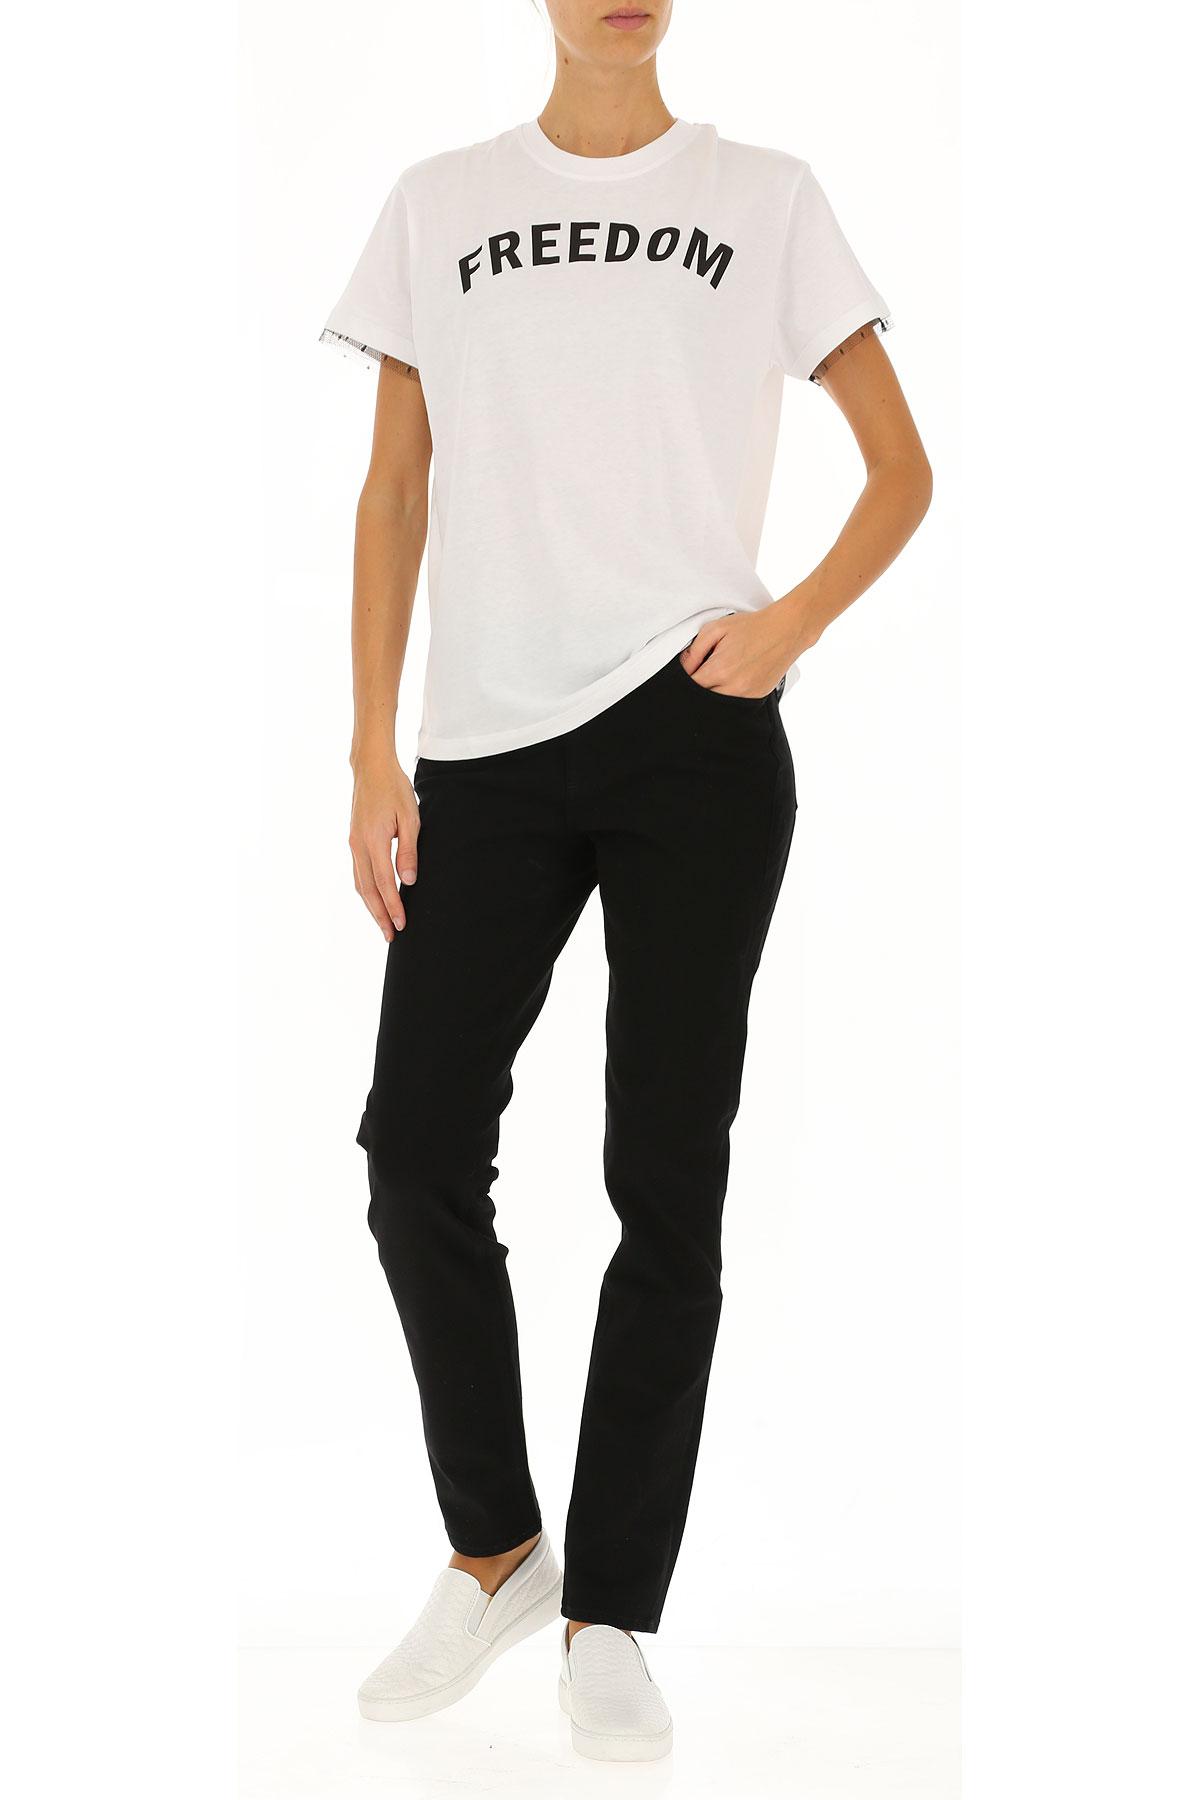 Image of Trussardi Jeans, Black, Cotton, 2017, 26 27 28 29 30 32 33 34